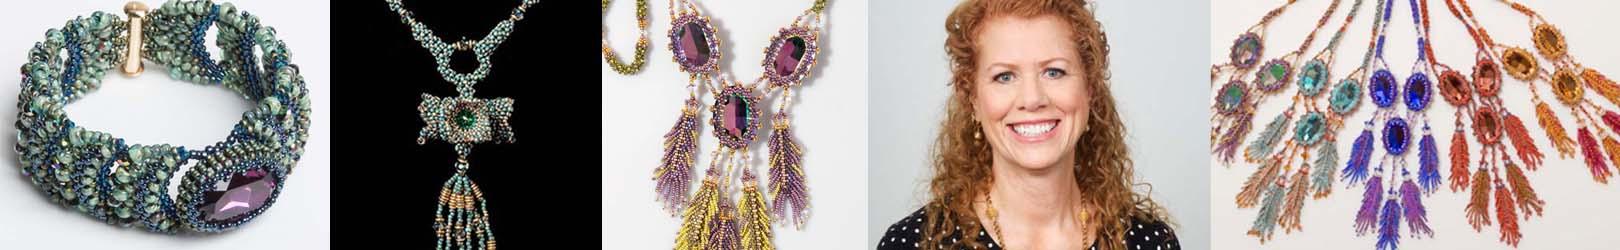 Beadwork artist Nancy Cain returns to BeadFX